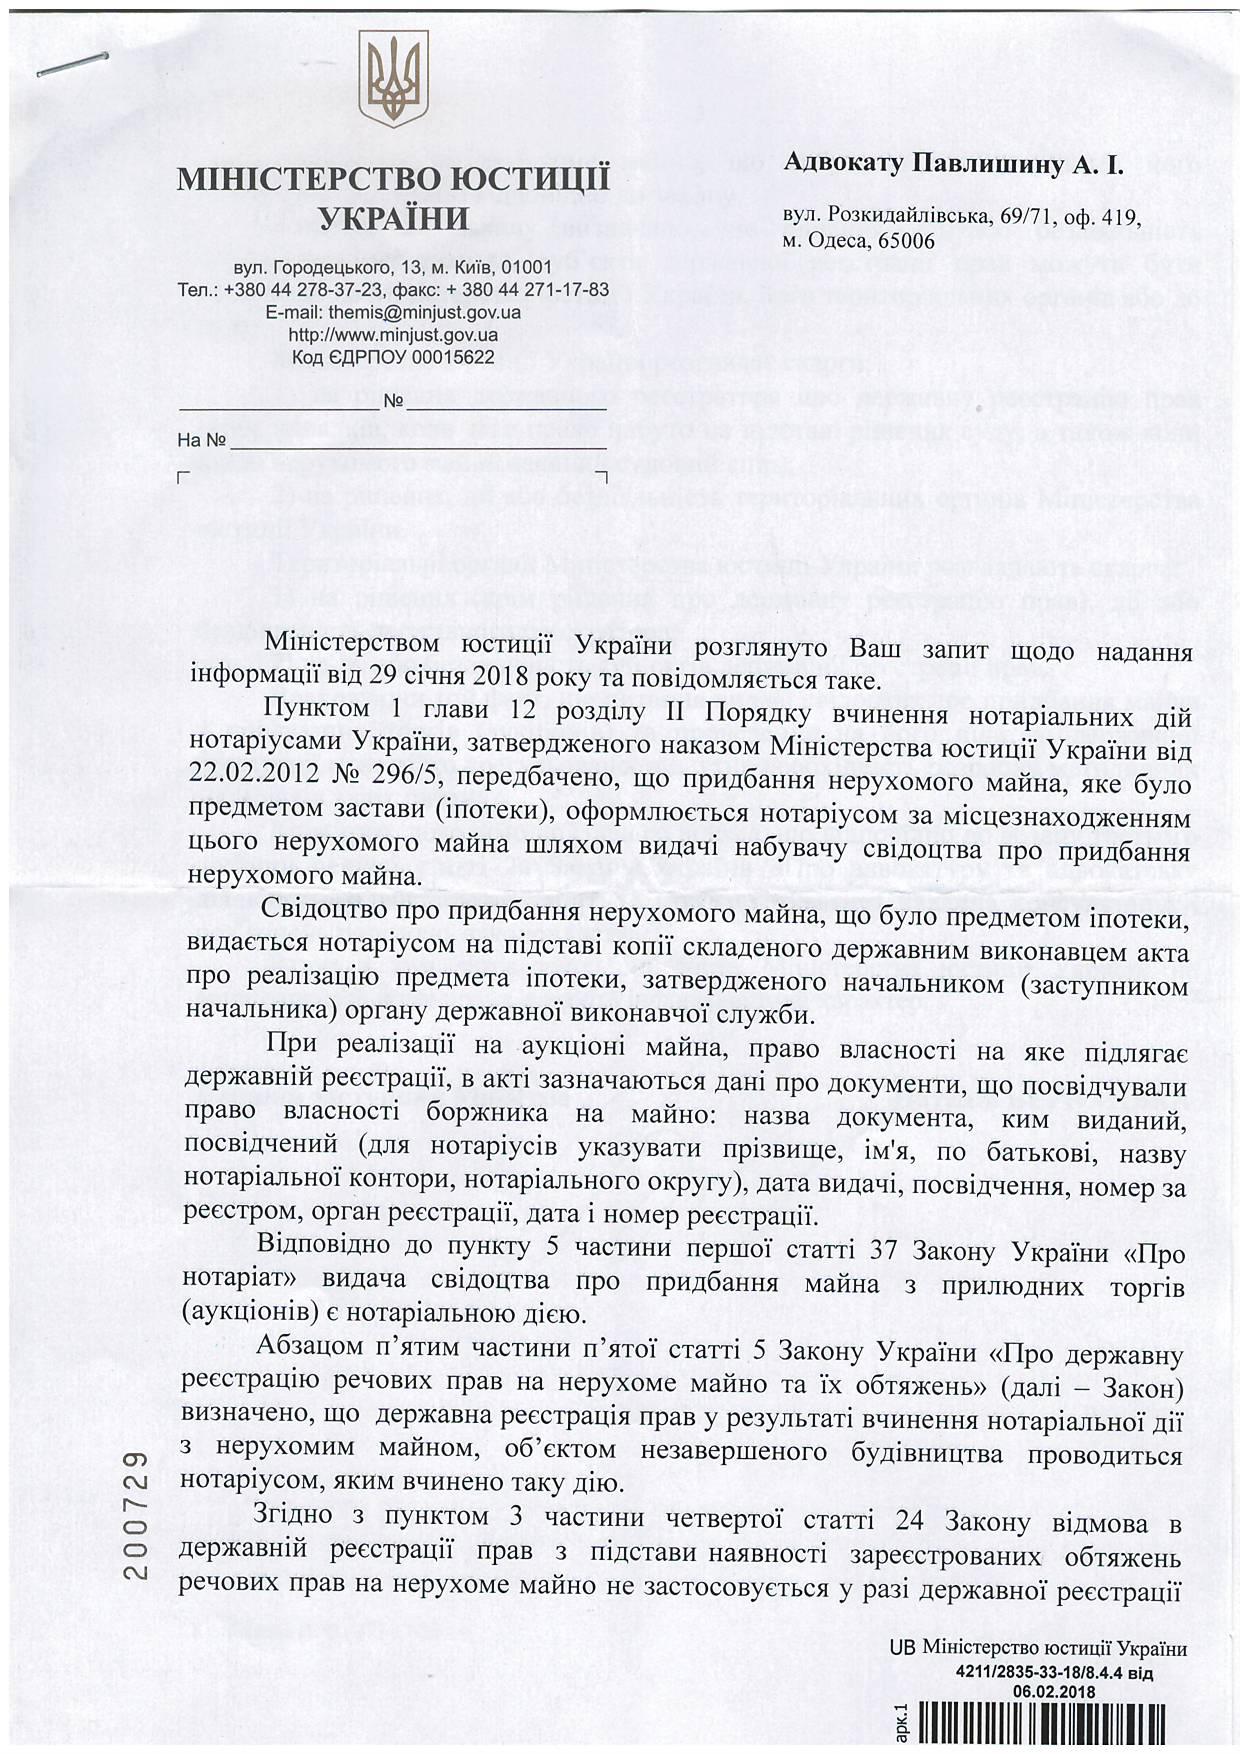 image http://forum.setam.net.ua/assets/images/79-ElAJH2xmV1EjUfHK.jpeg